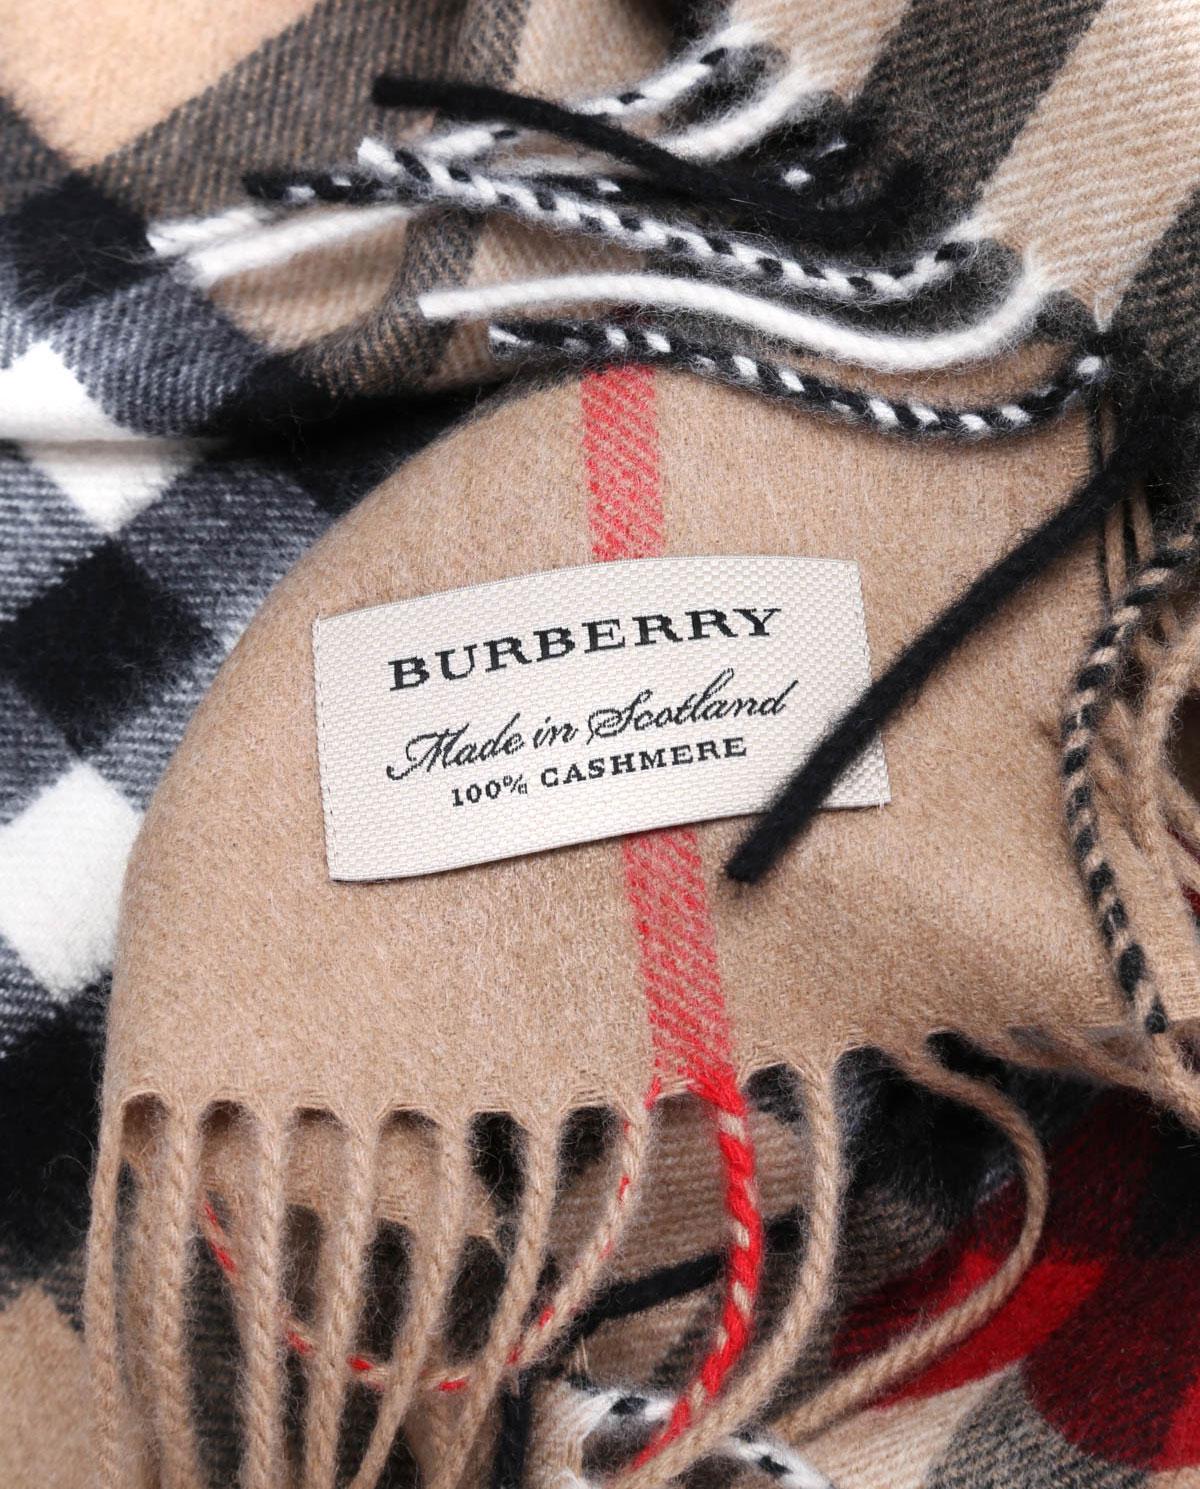 szalik burberry kup teraz najlepsze ceny i opinie sklep. Black Bedroom Furniture Sets. Home Design Ideas